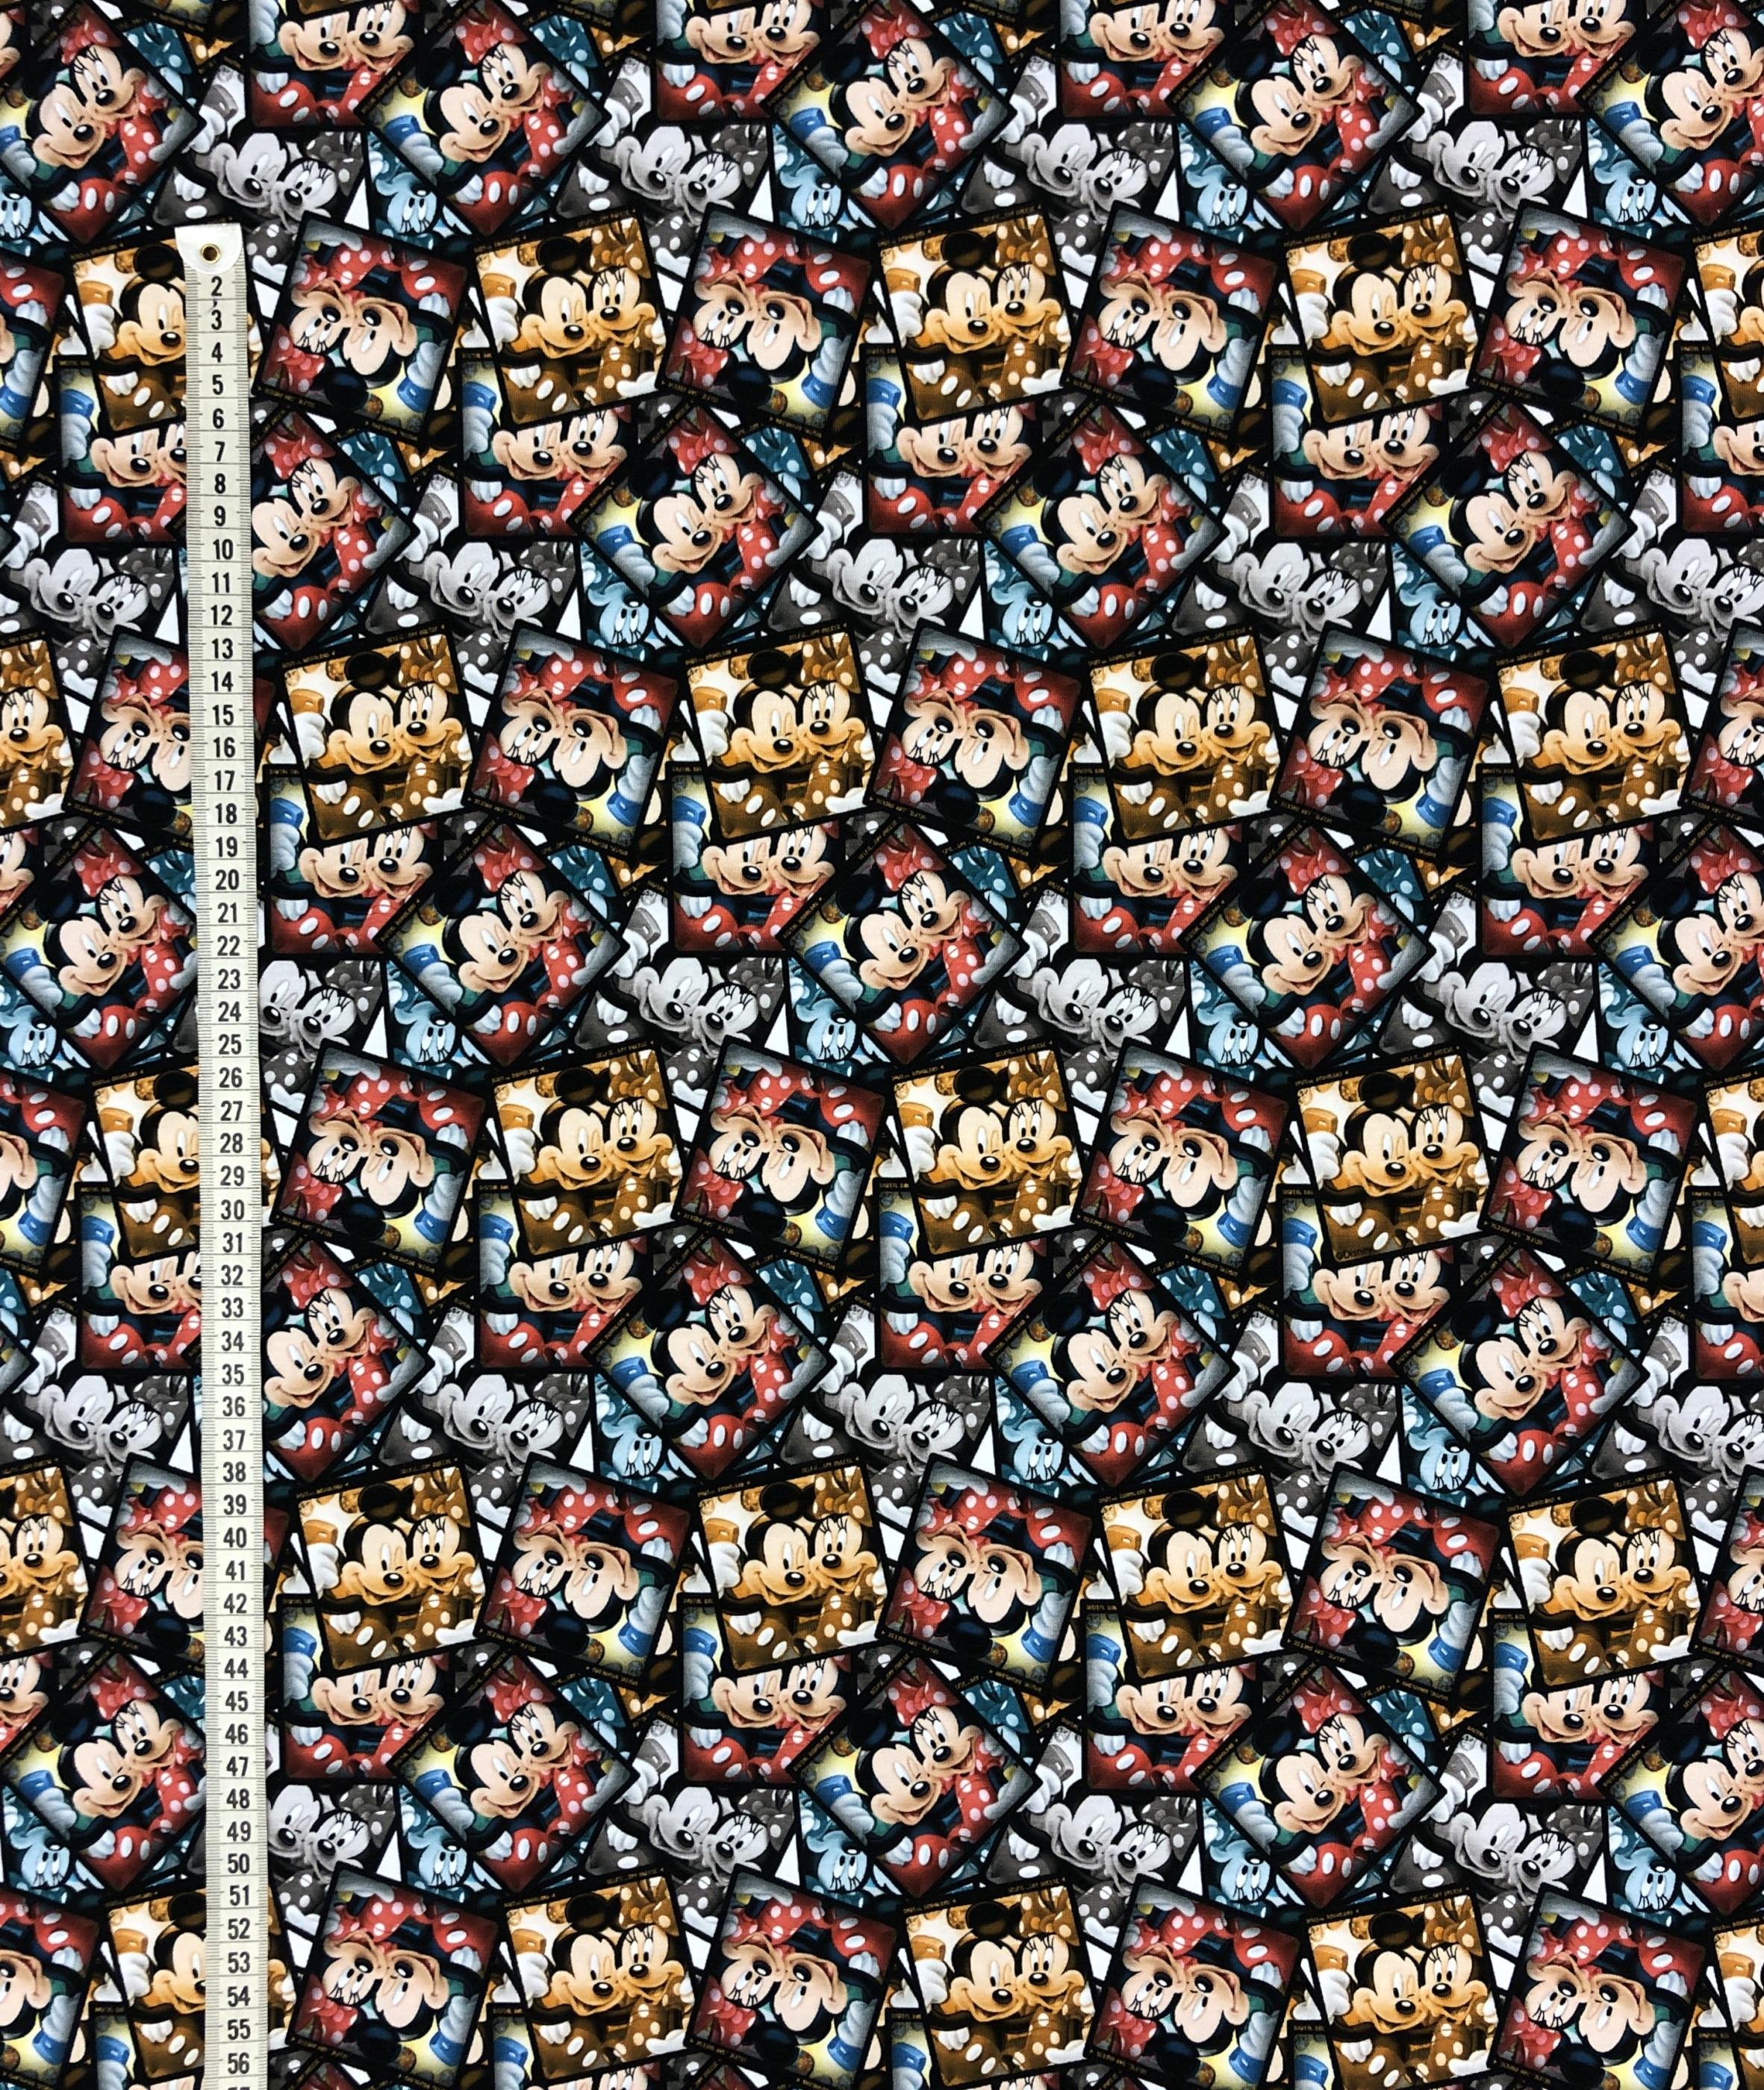 Musse Mimmi Disney polaroid foto trikå barntrikå bomullstrikå metervara Tyglust laholm